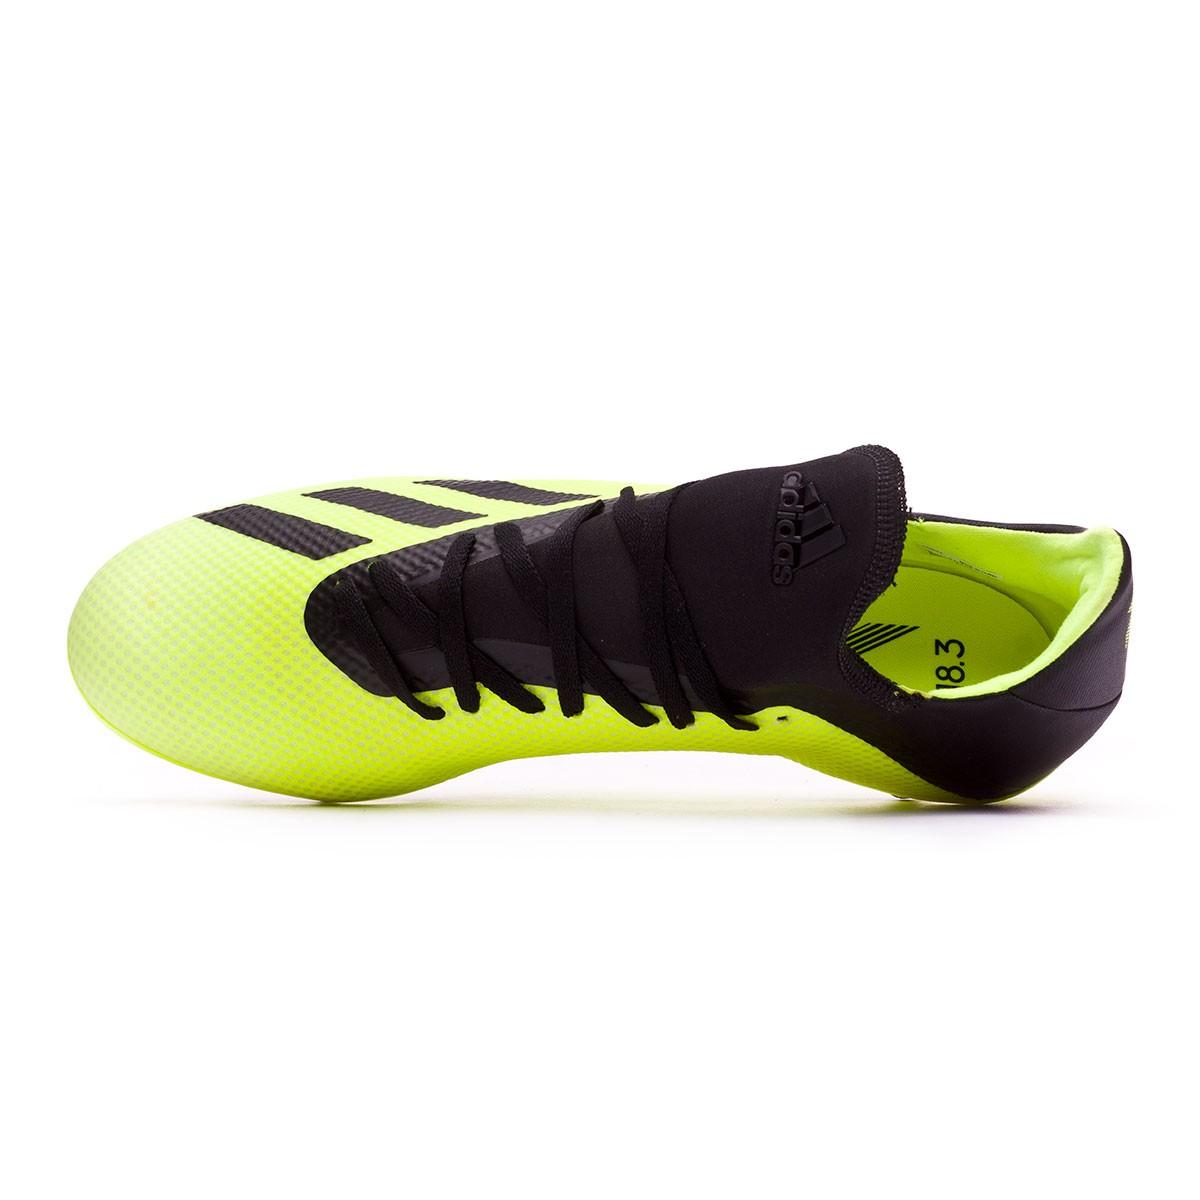 new style b58b3 d3bc2 Zapatos de fútbol adidas X 18.3 AG Solar yellow-Core black-White - Tienda  de fútbol Fútbol Emotion